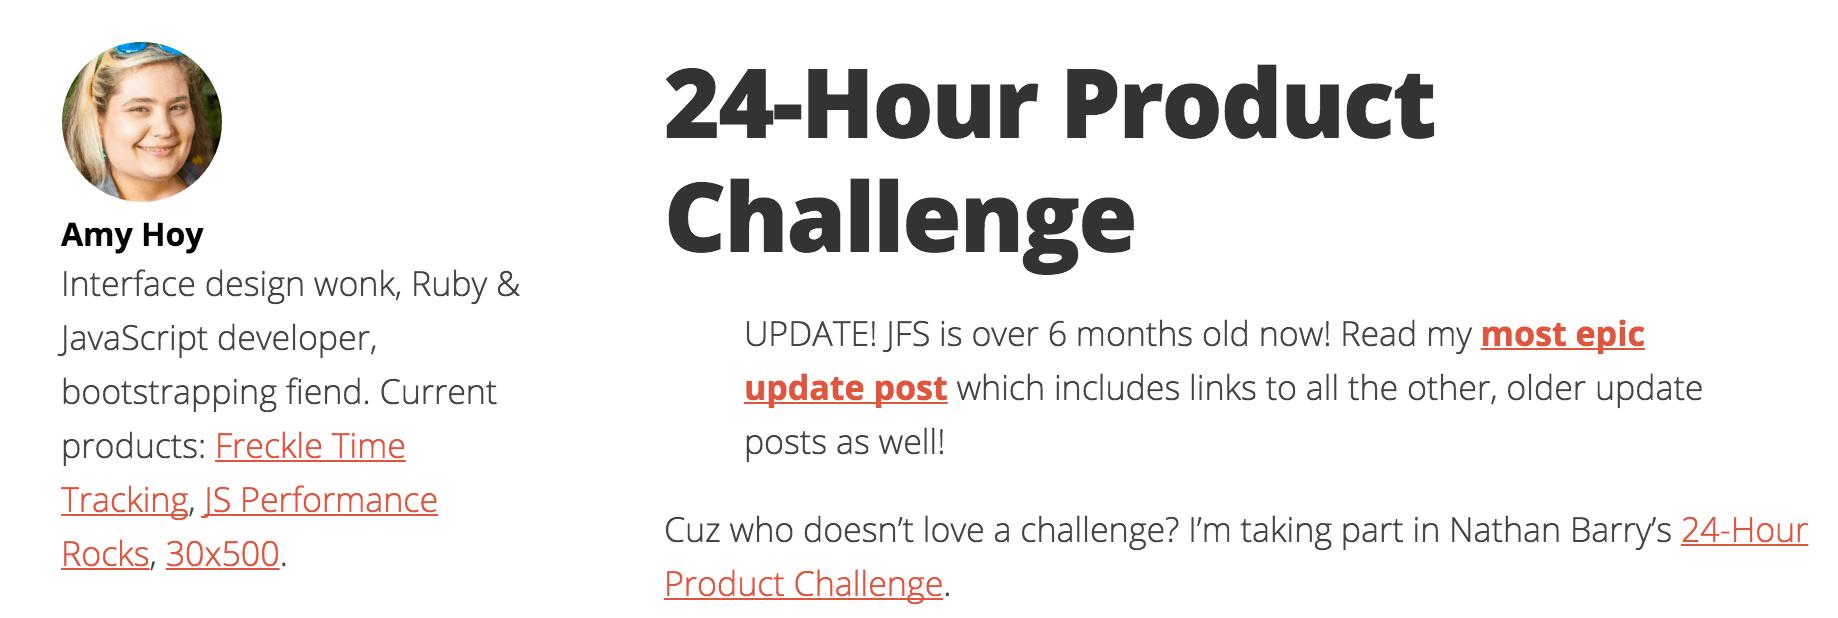 24 hour challenge unicornfree